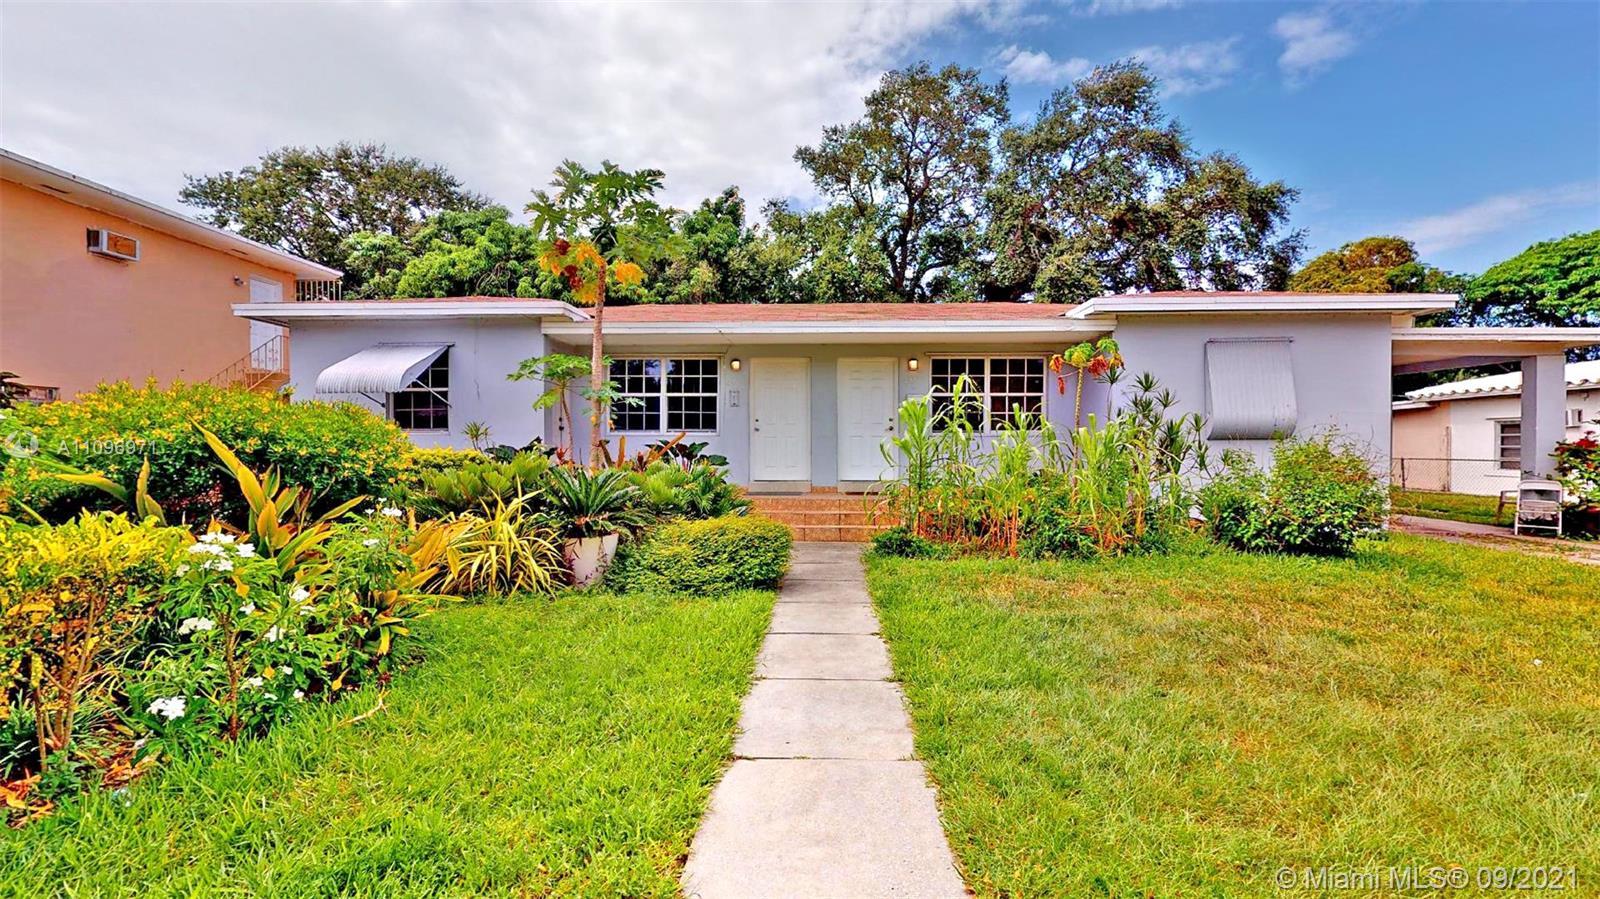 570 NE 134th St, North Miami, Florida 33161, ,Residential Income,For Sale,134th St,A11096971